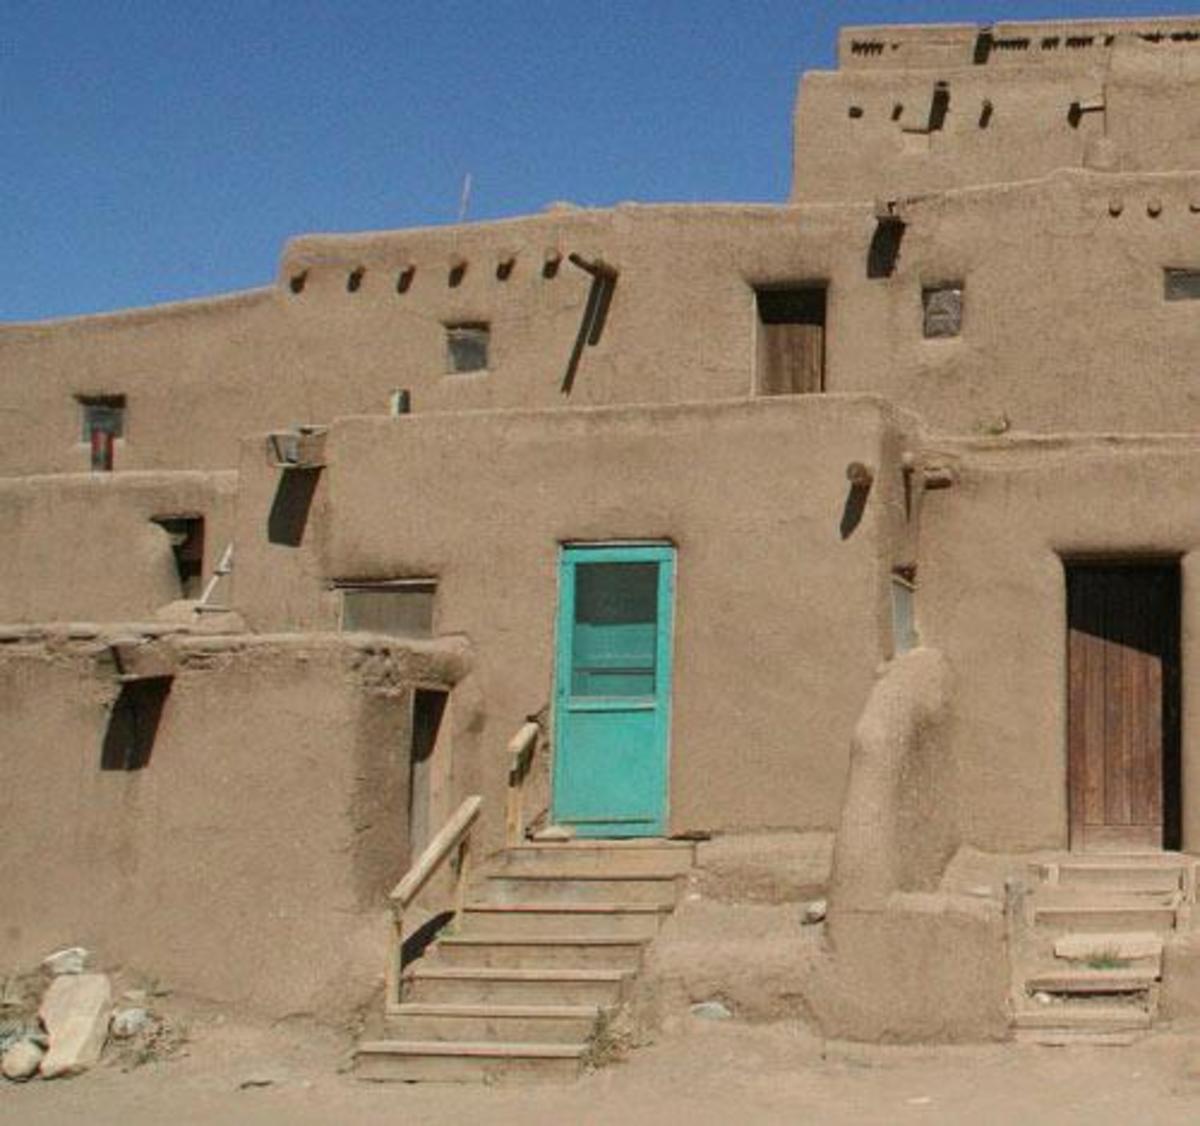 Taos pueblo with blue door similar to Henrietta's pueblo.